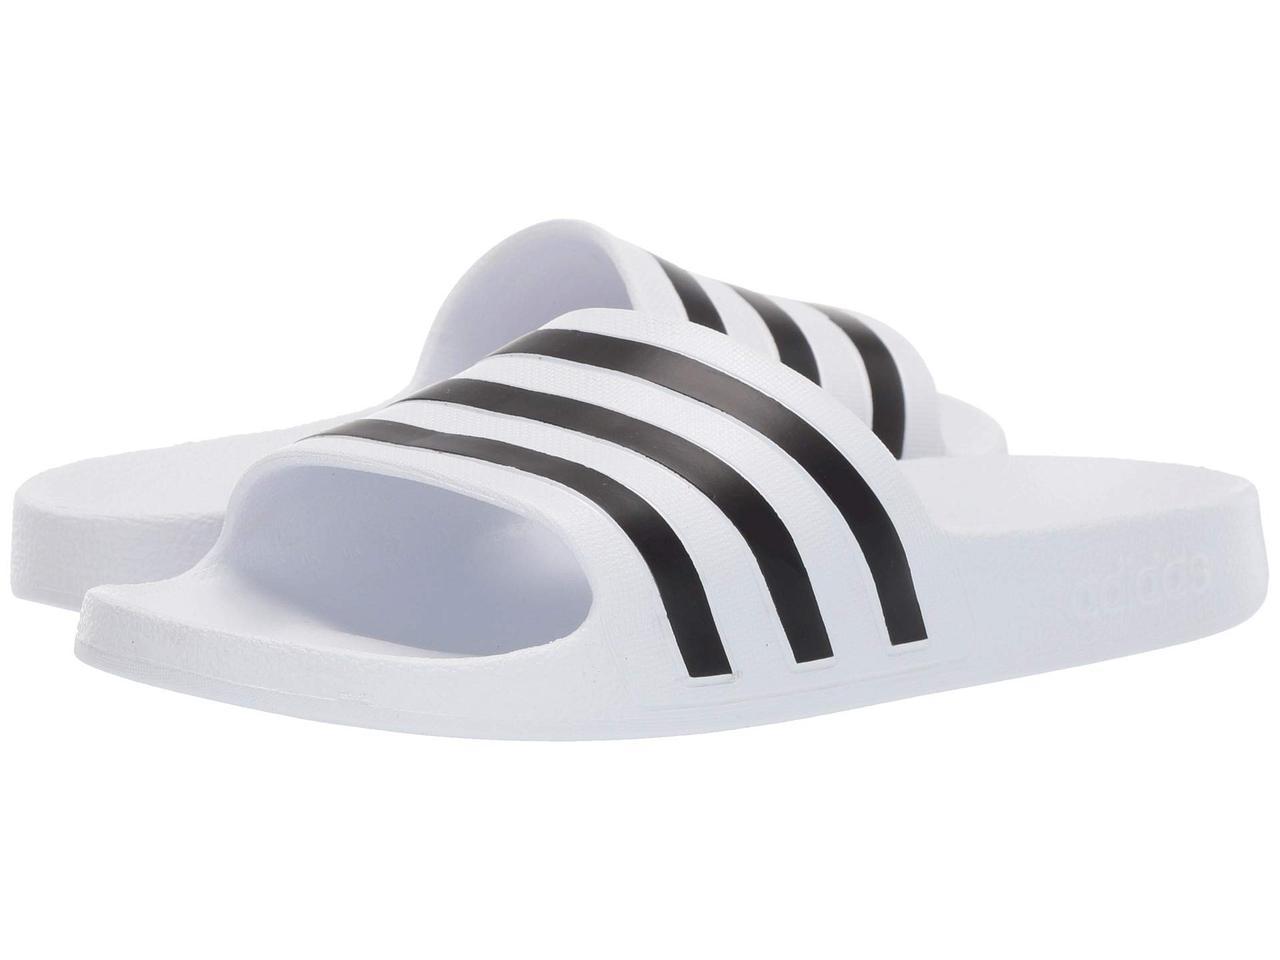 eda7613109f Сандали/Вьетнамки (Оригинал) adidas Adilette Aqua Footwear White/Core  Black/Footwear White: продажа, цена в ...